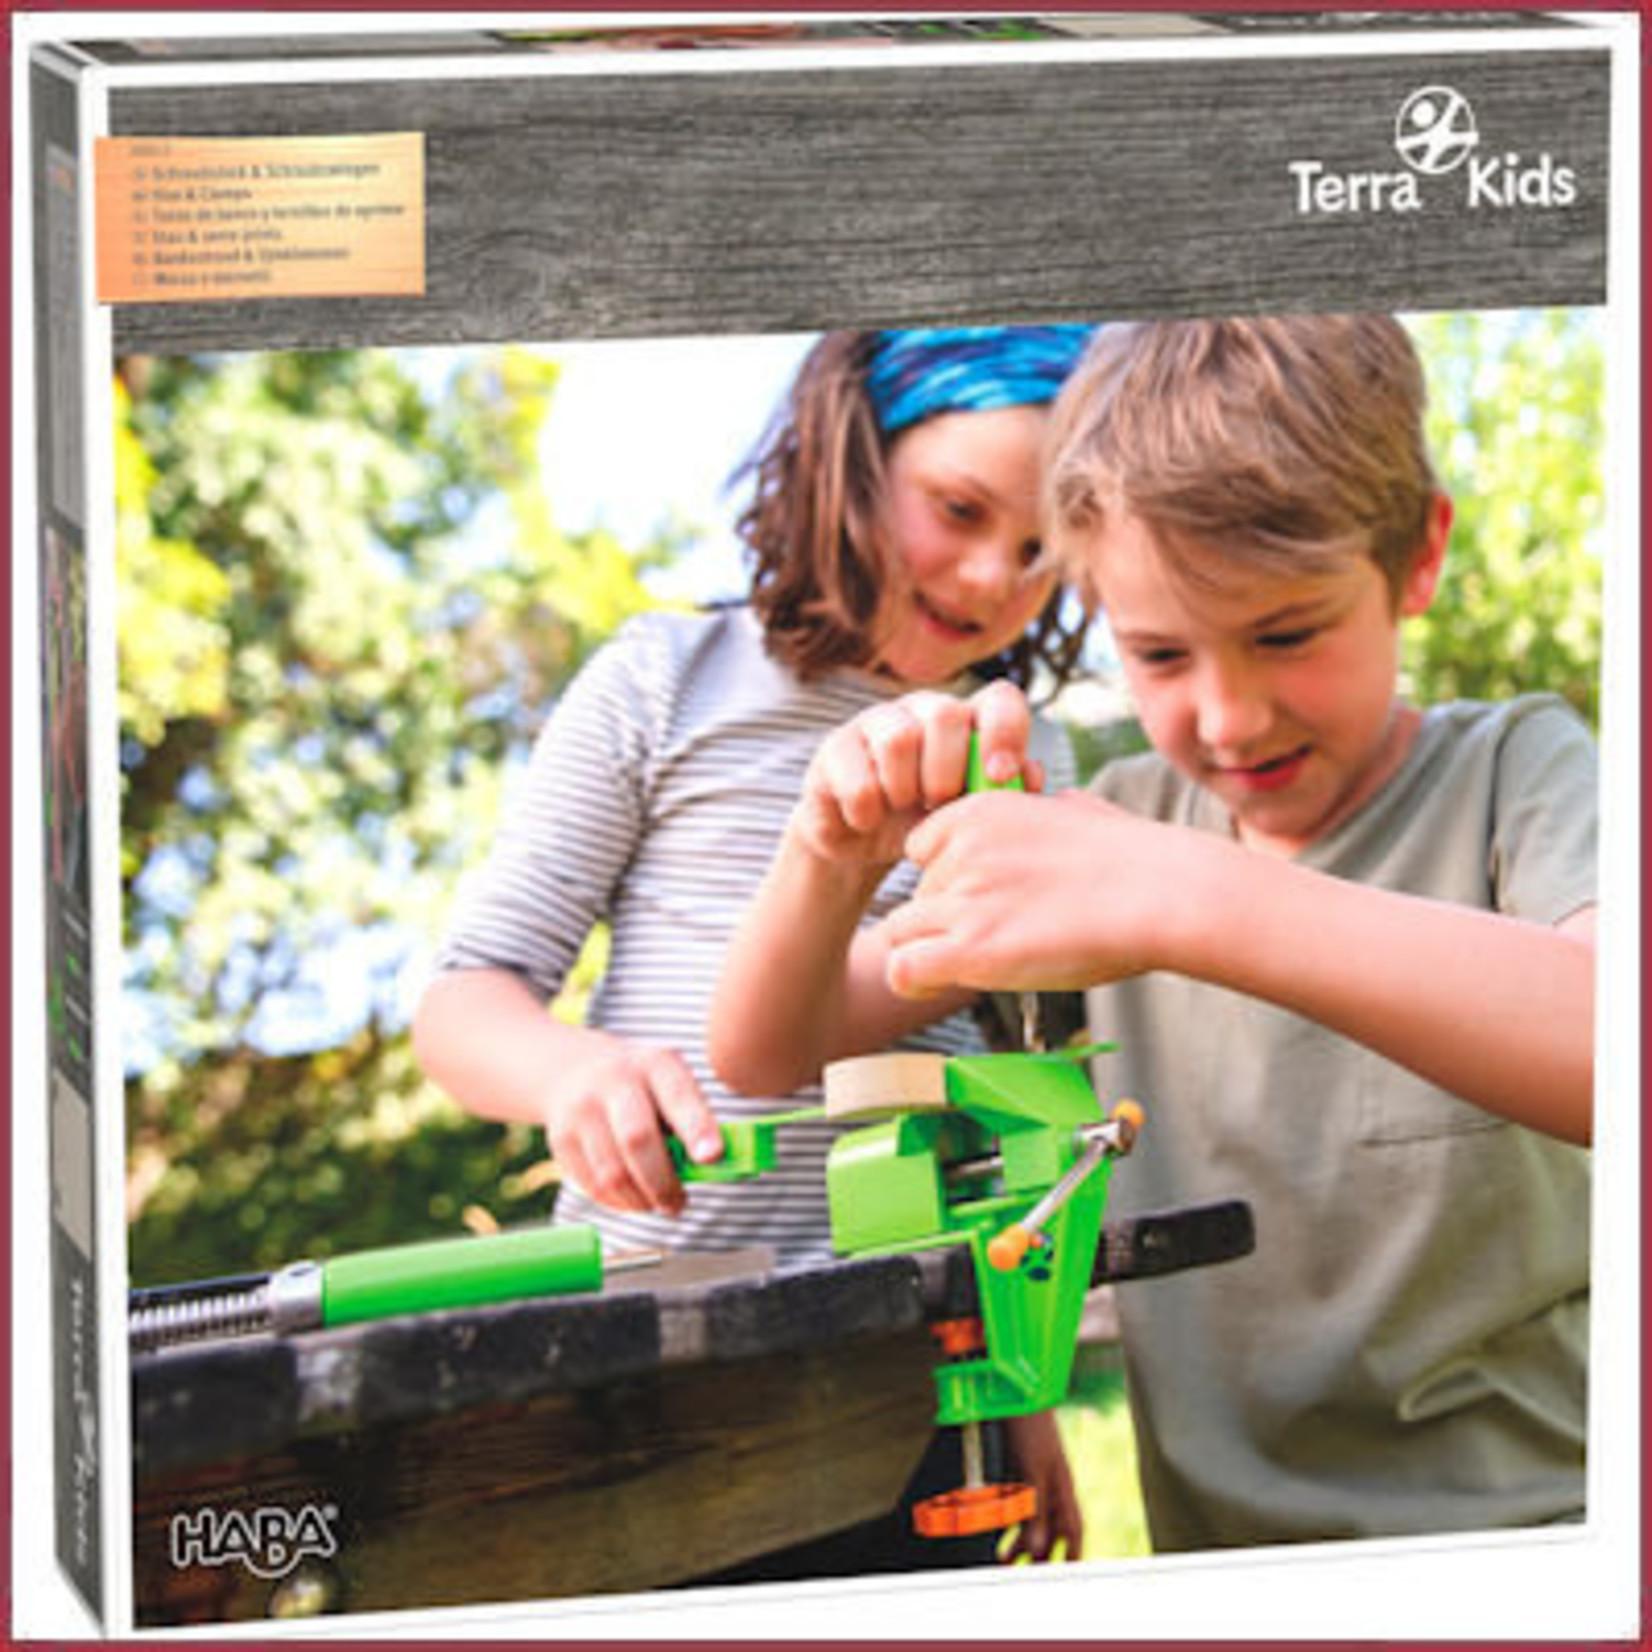 Haba Terra Kids - Bankschroef & Lijmklemmen